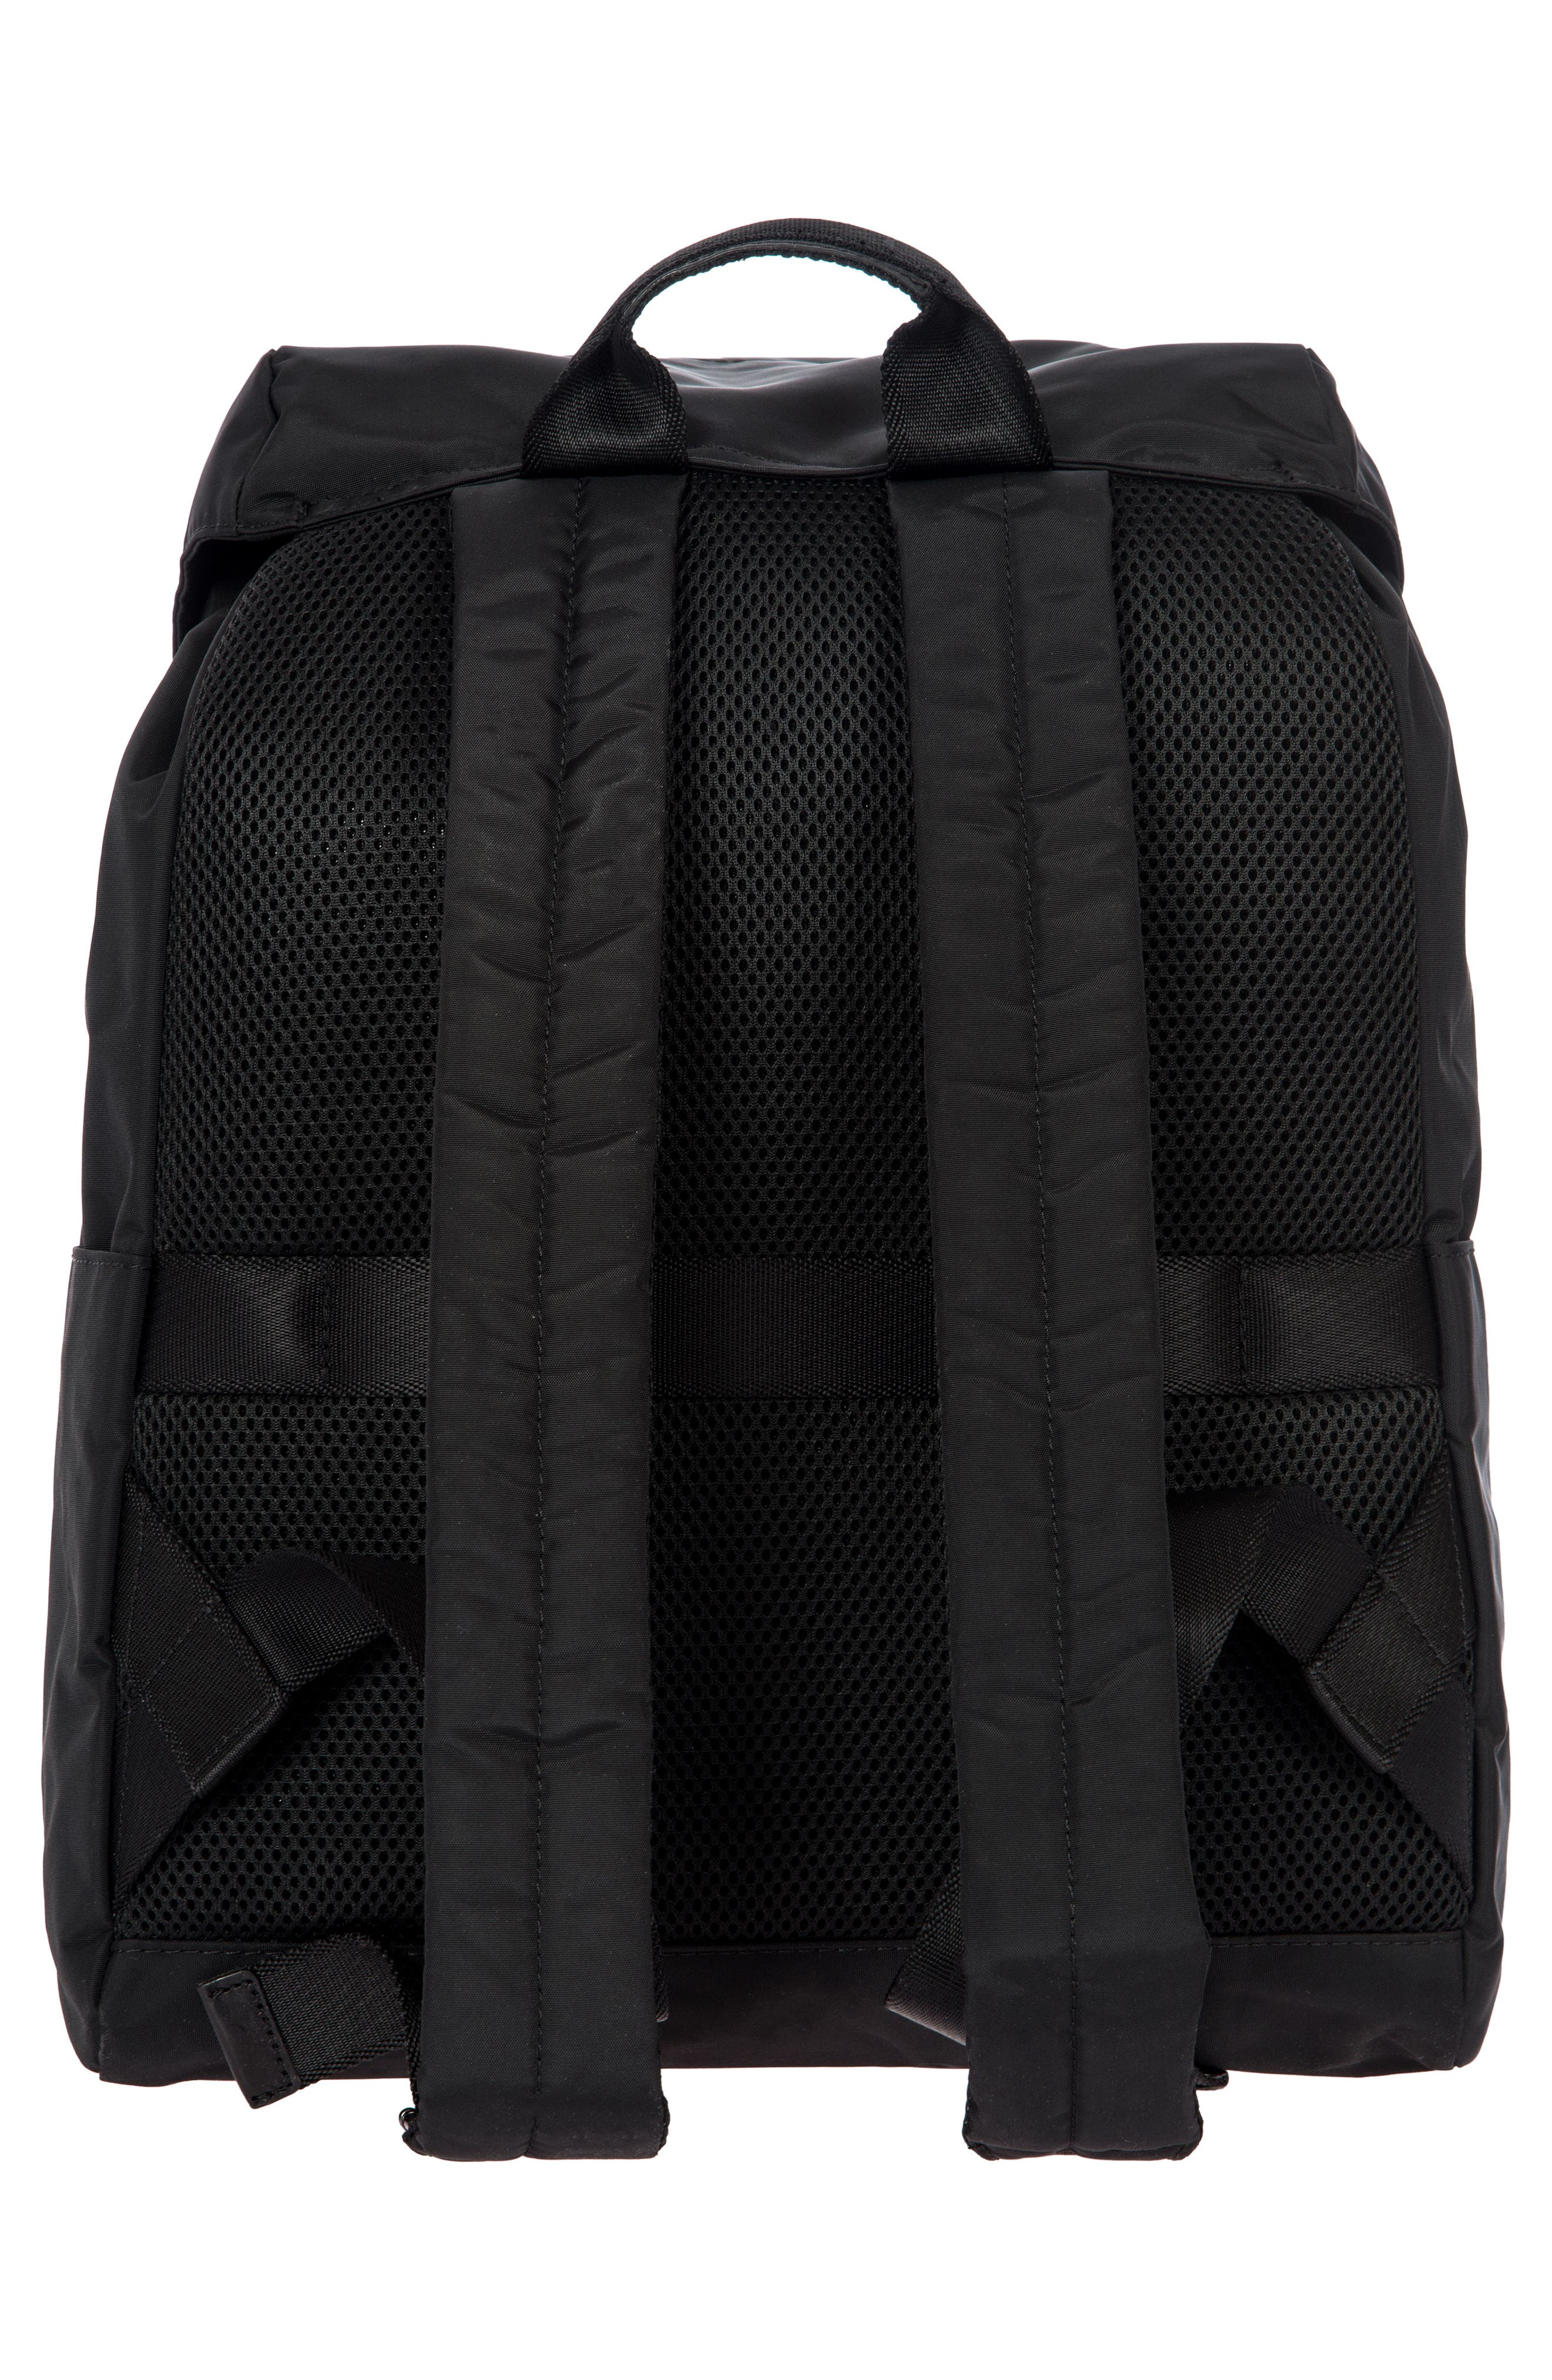 X-Bag Travel Excursion Backpack,                             Alternate thumbnail 2, color,                             BLACK/ BLACK